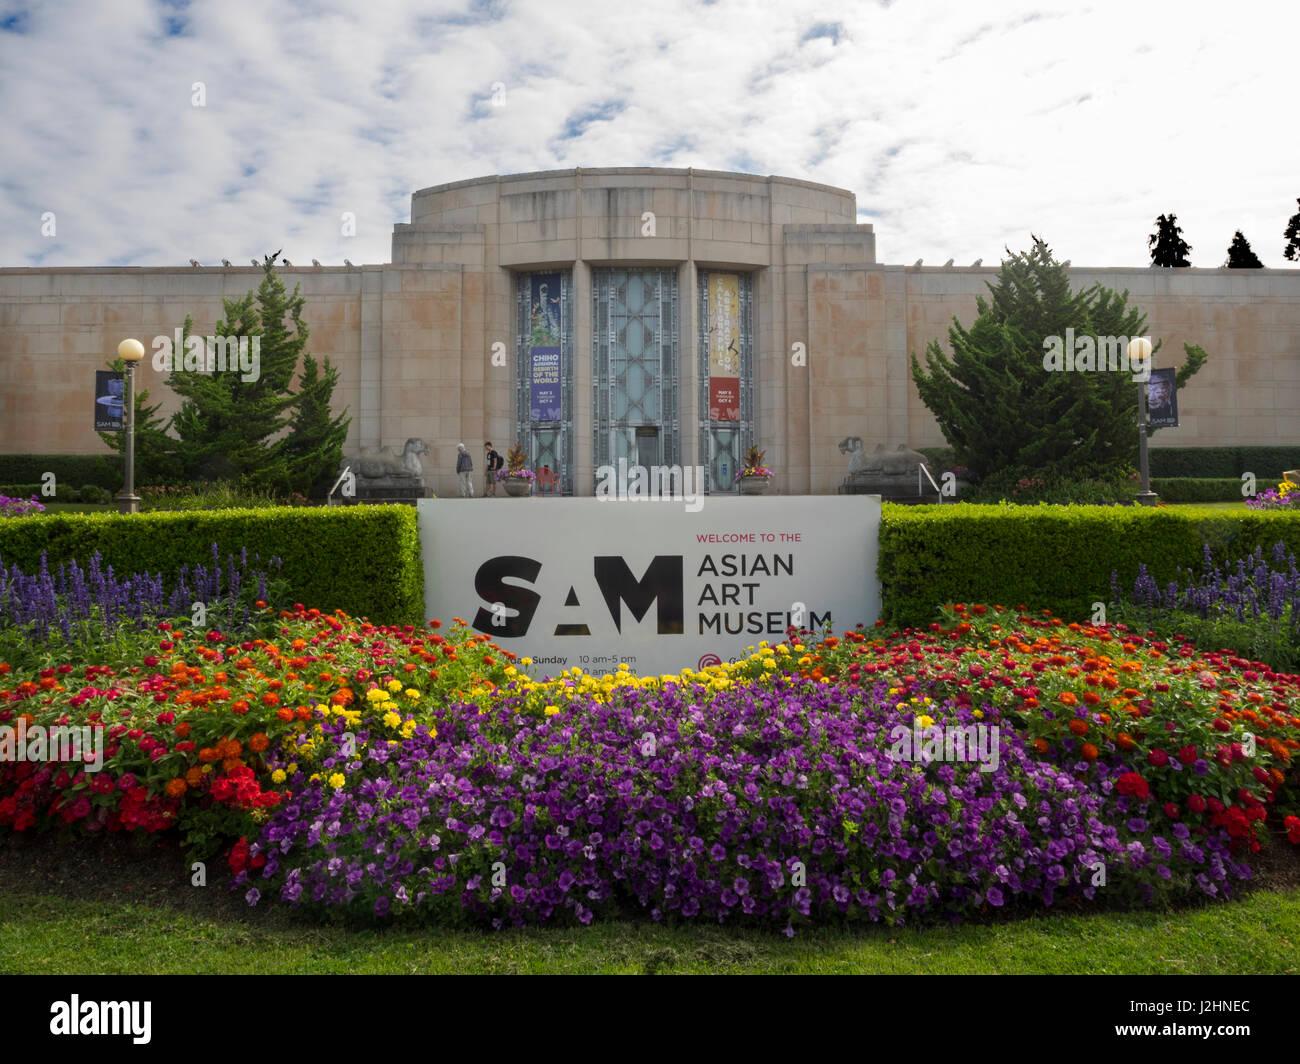 WA, Seattle, Volunteer Park, Asian Art Museum - Stock Image